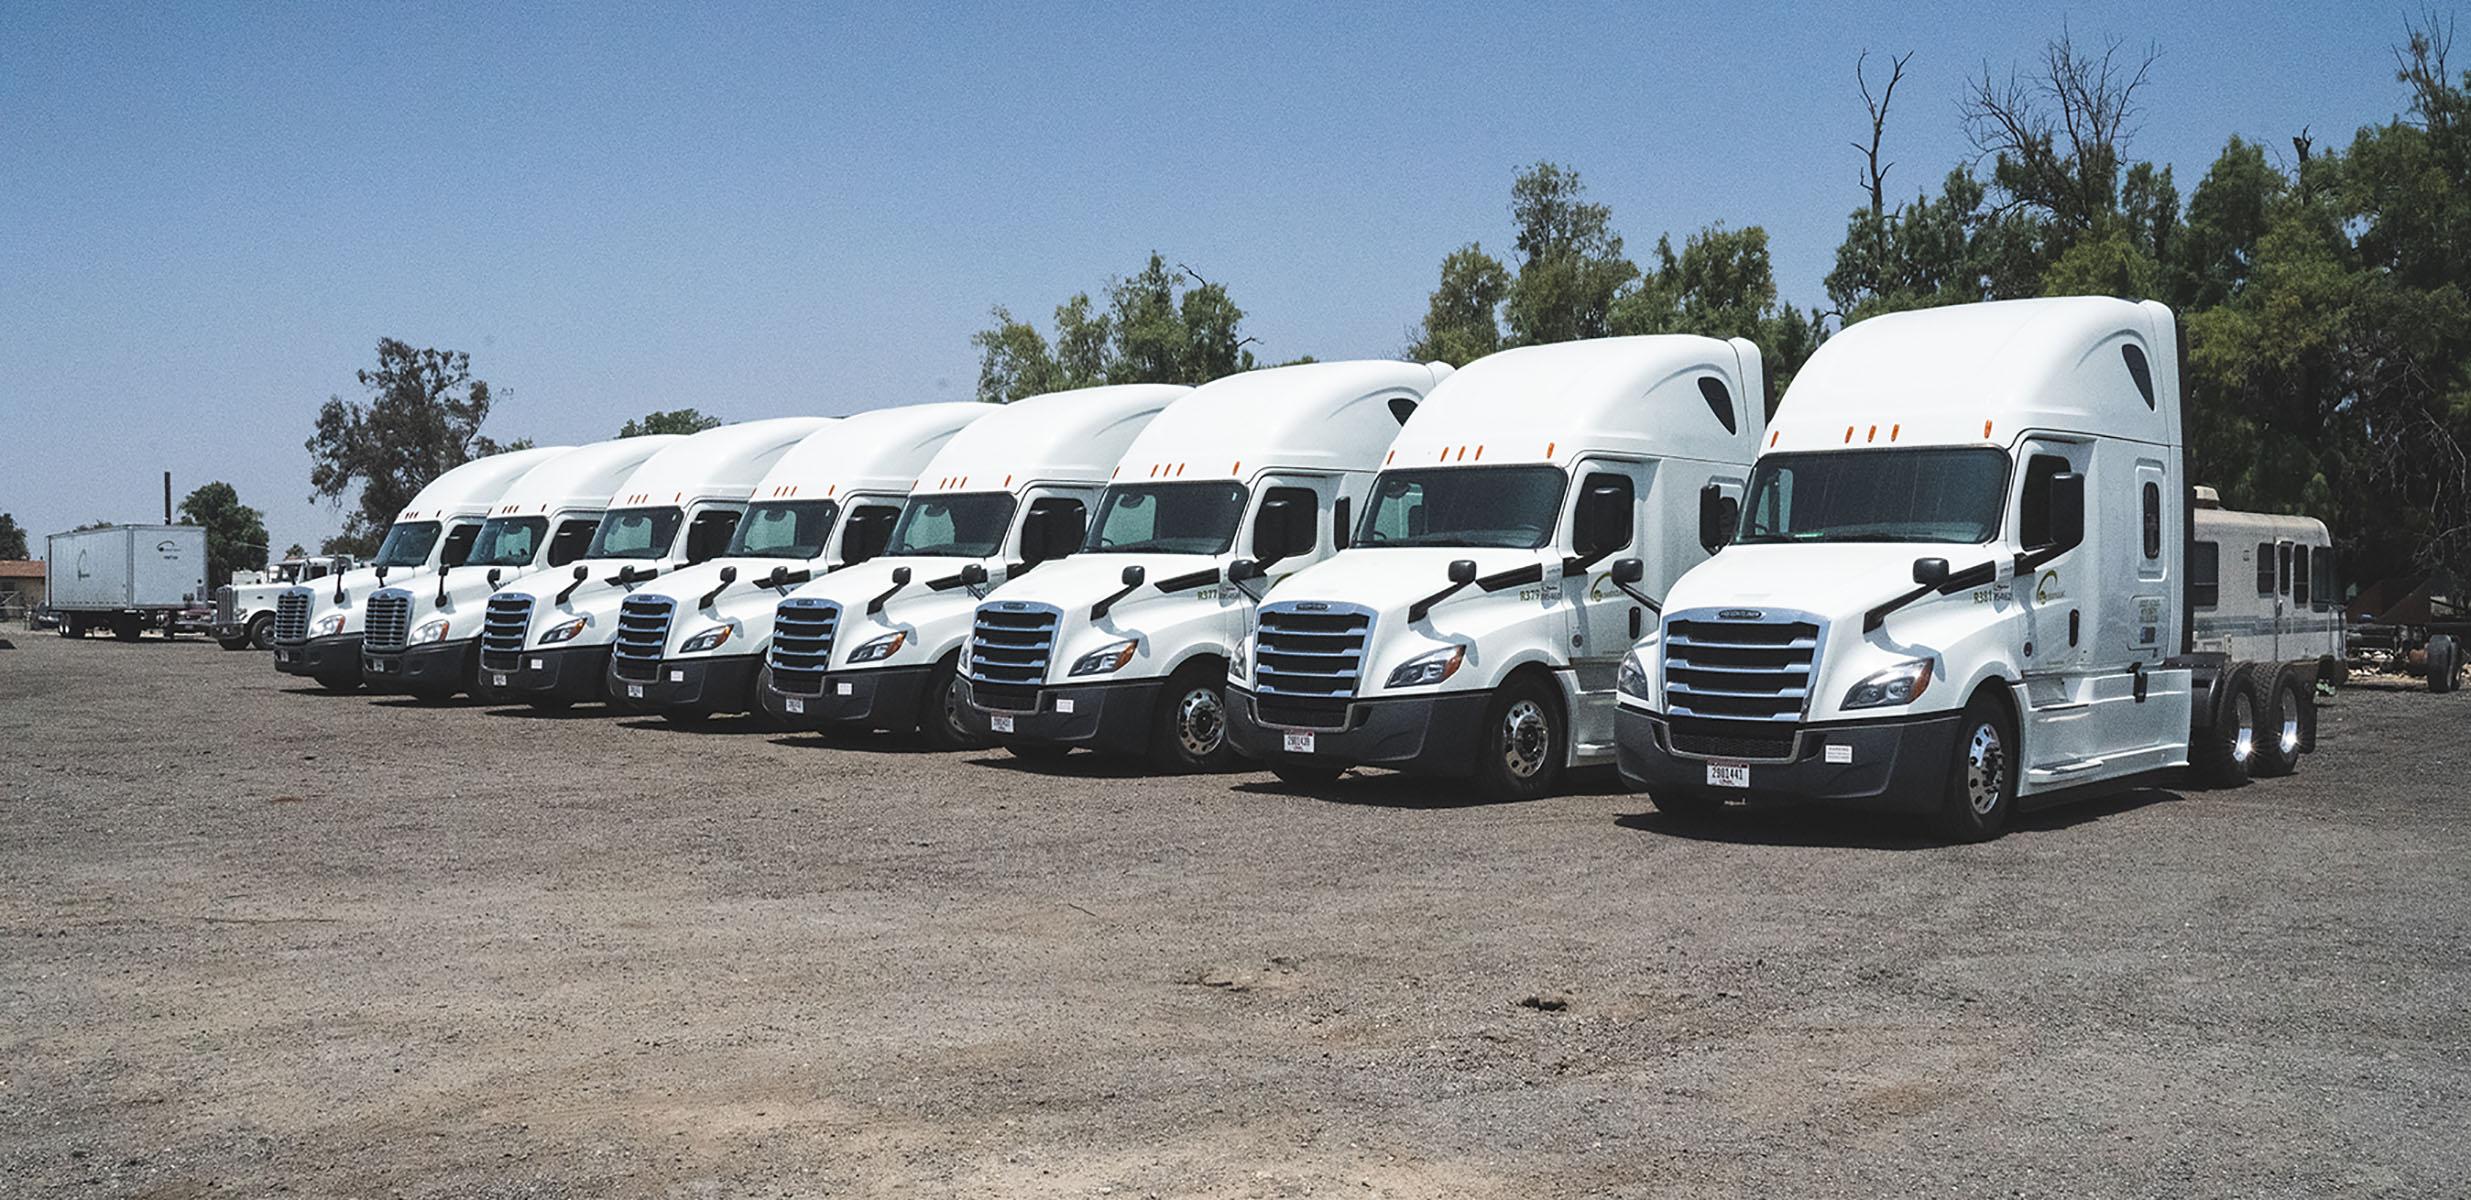 DGC's fleet